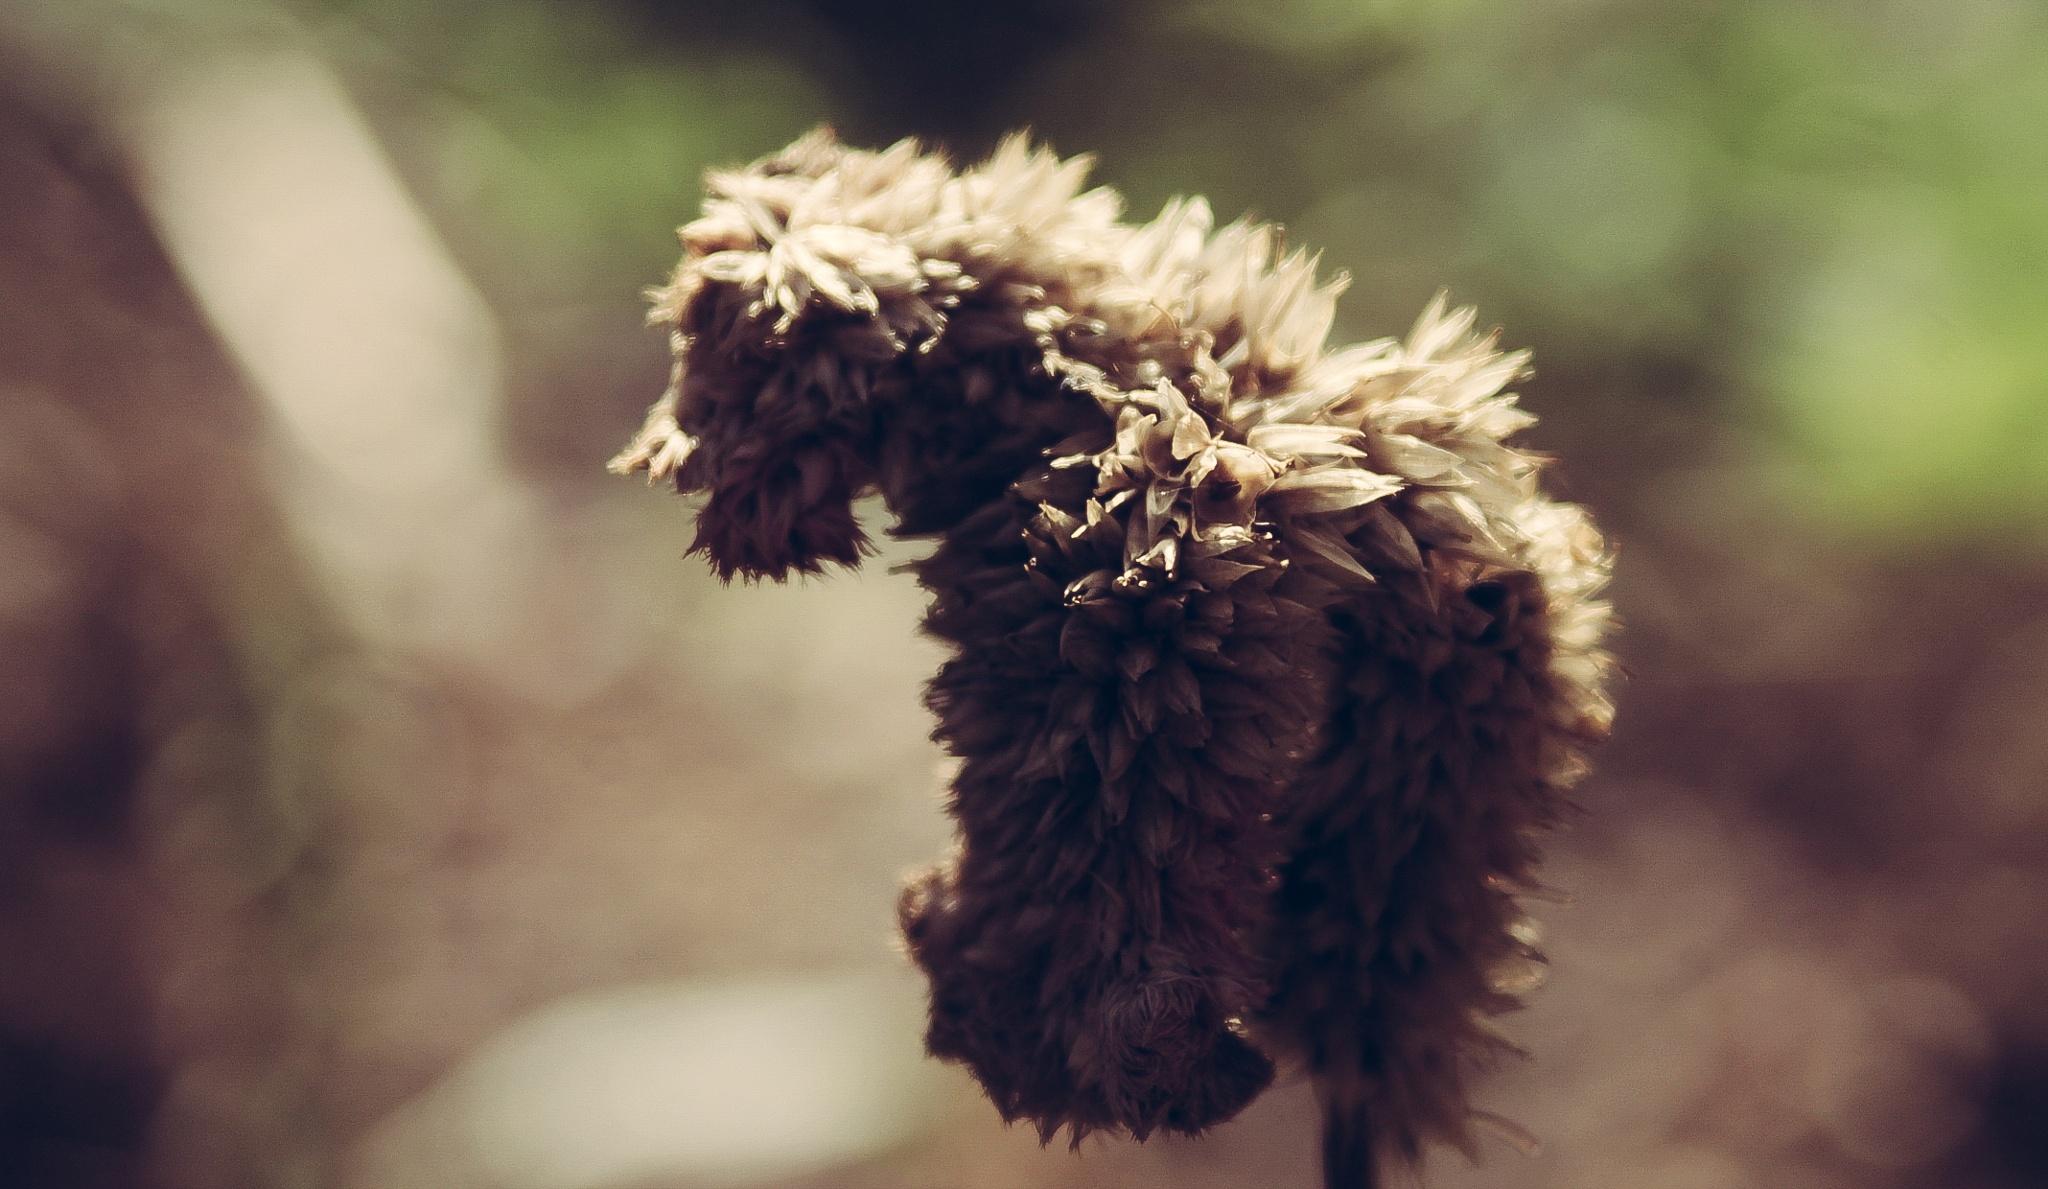 Flower by elbunitr